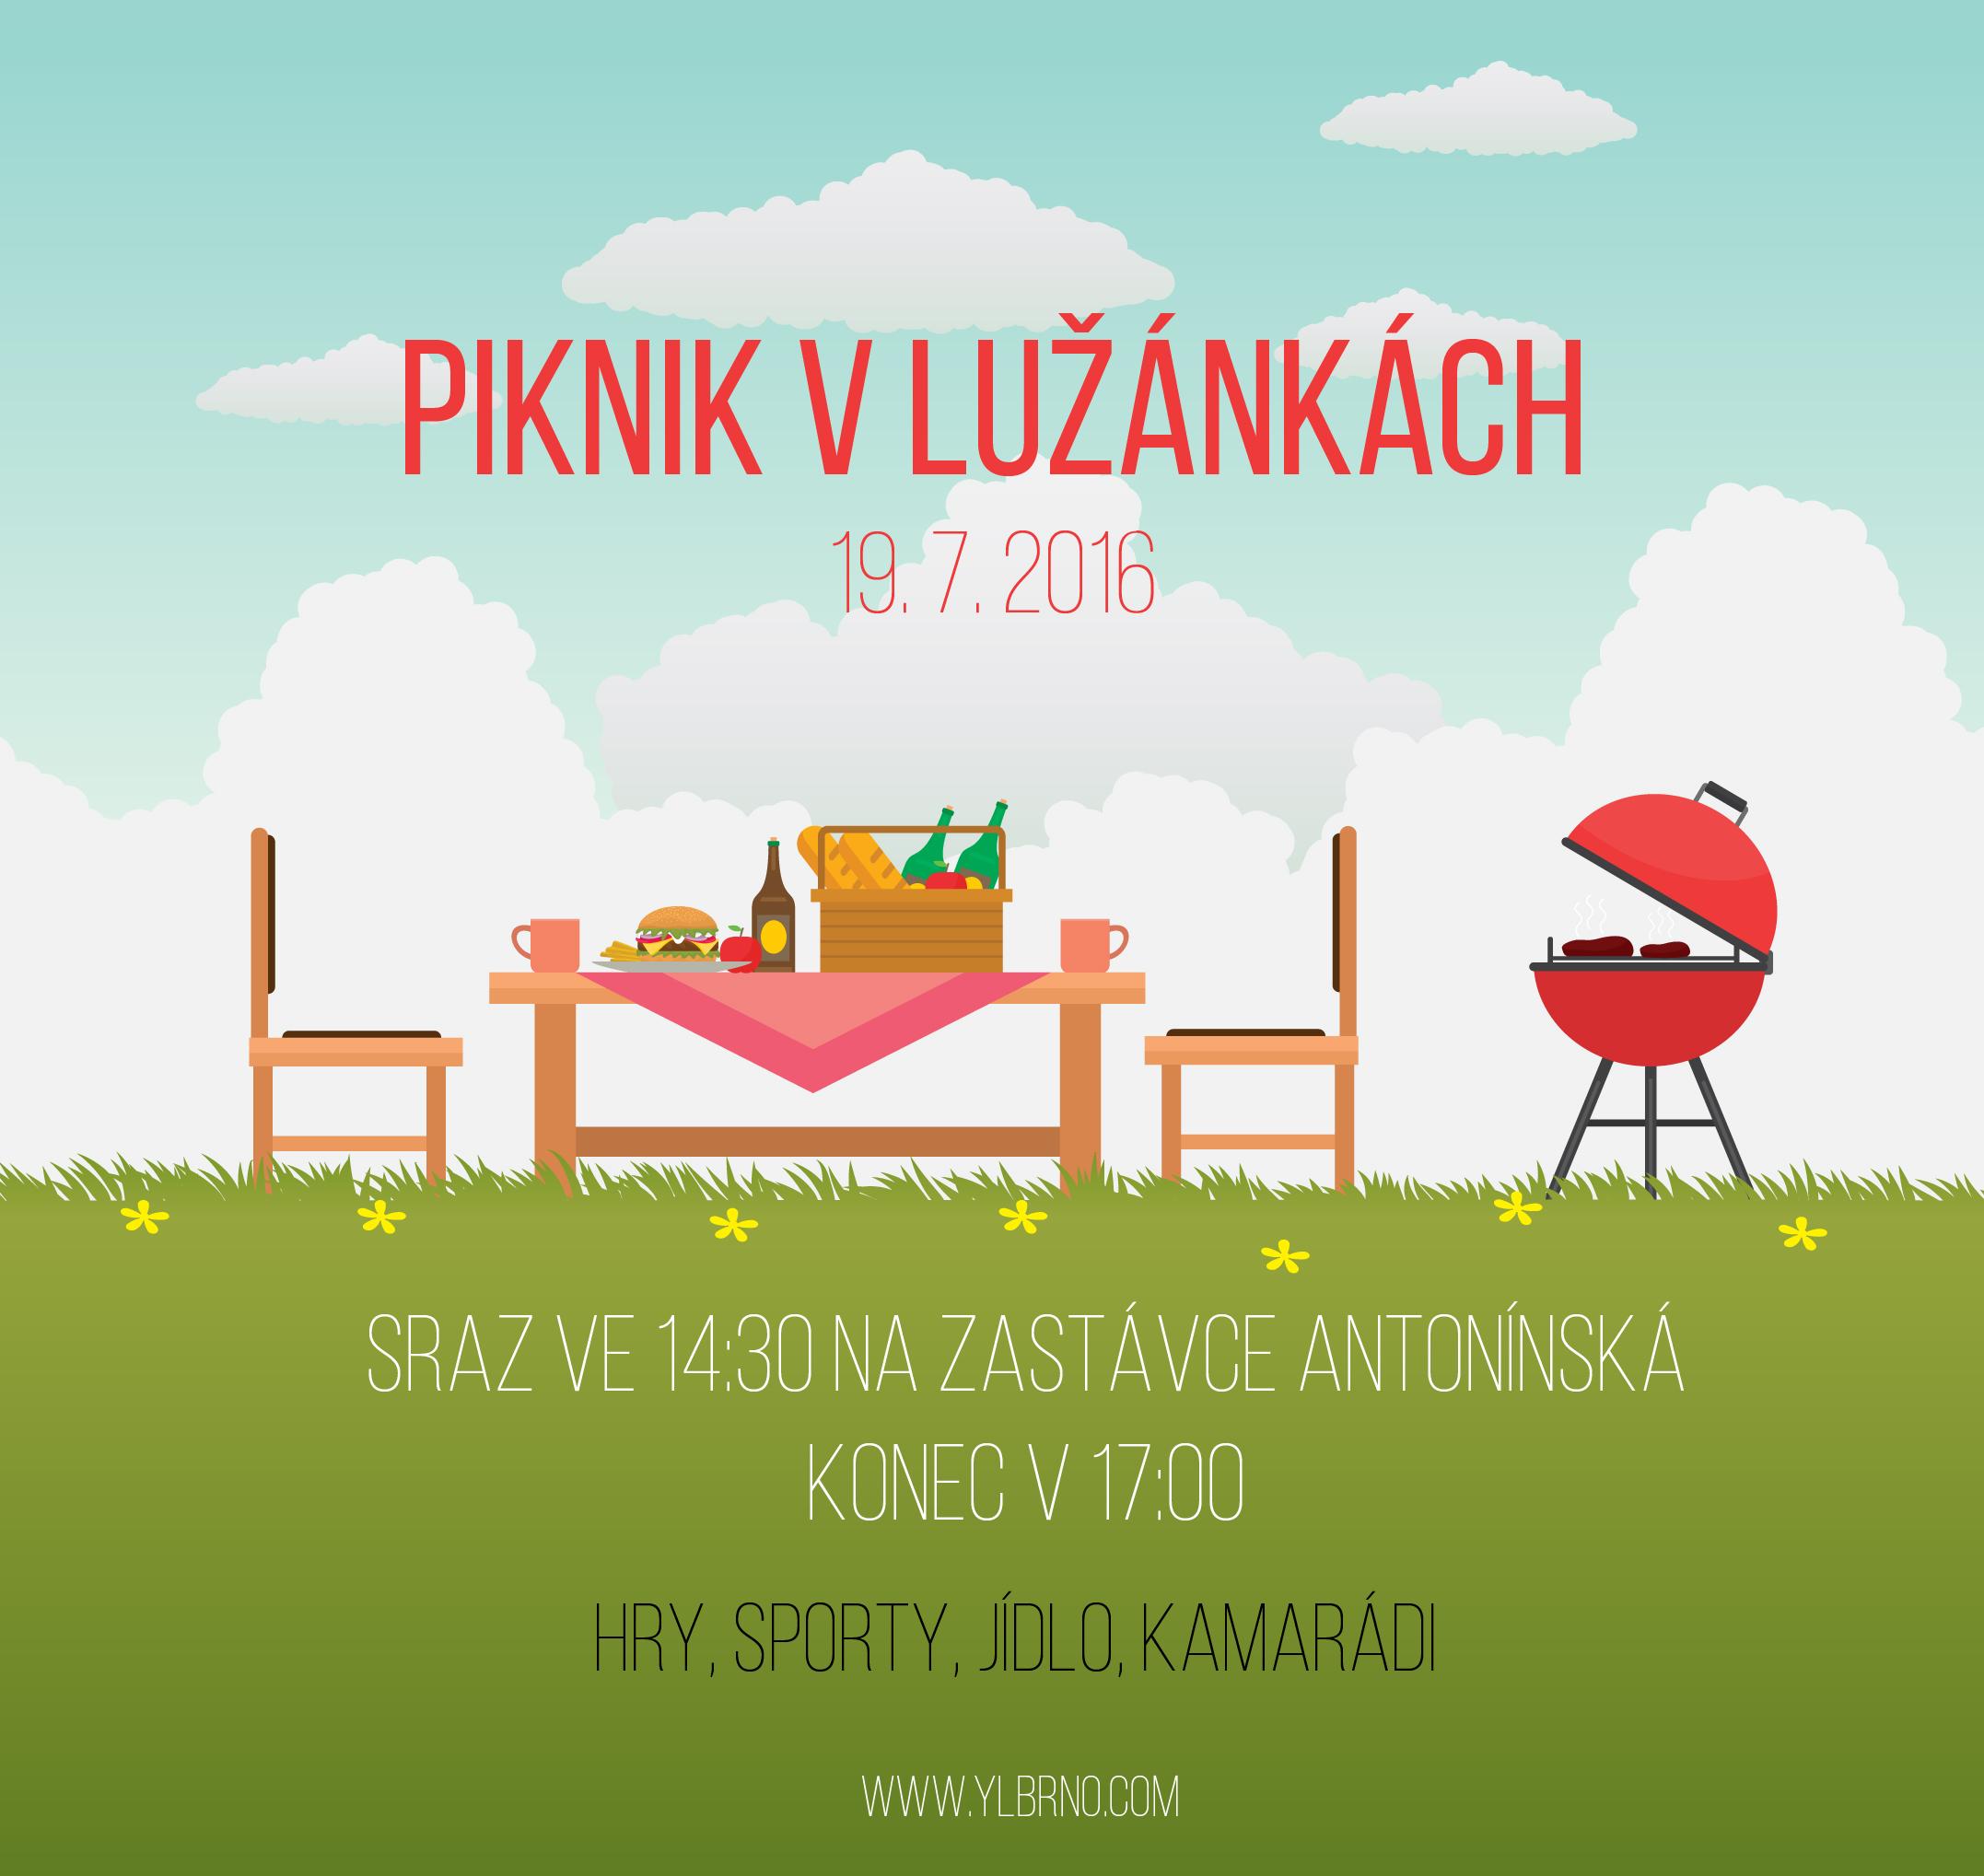 WL_Piknik.jpg